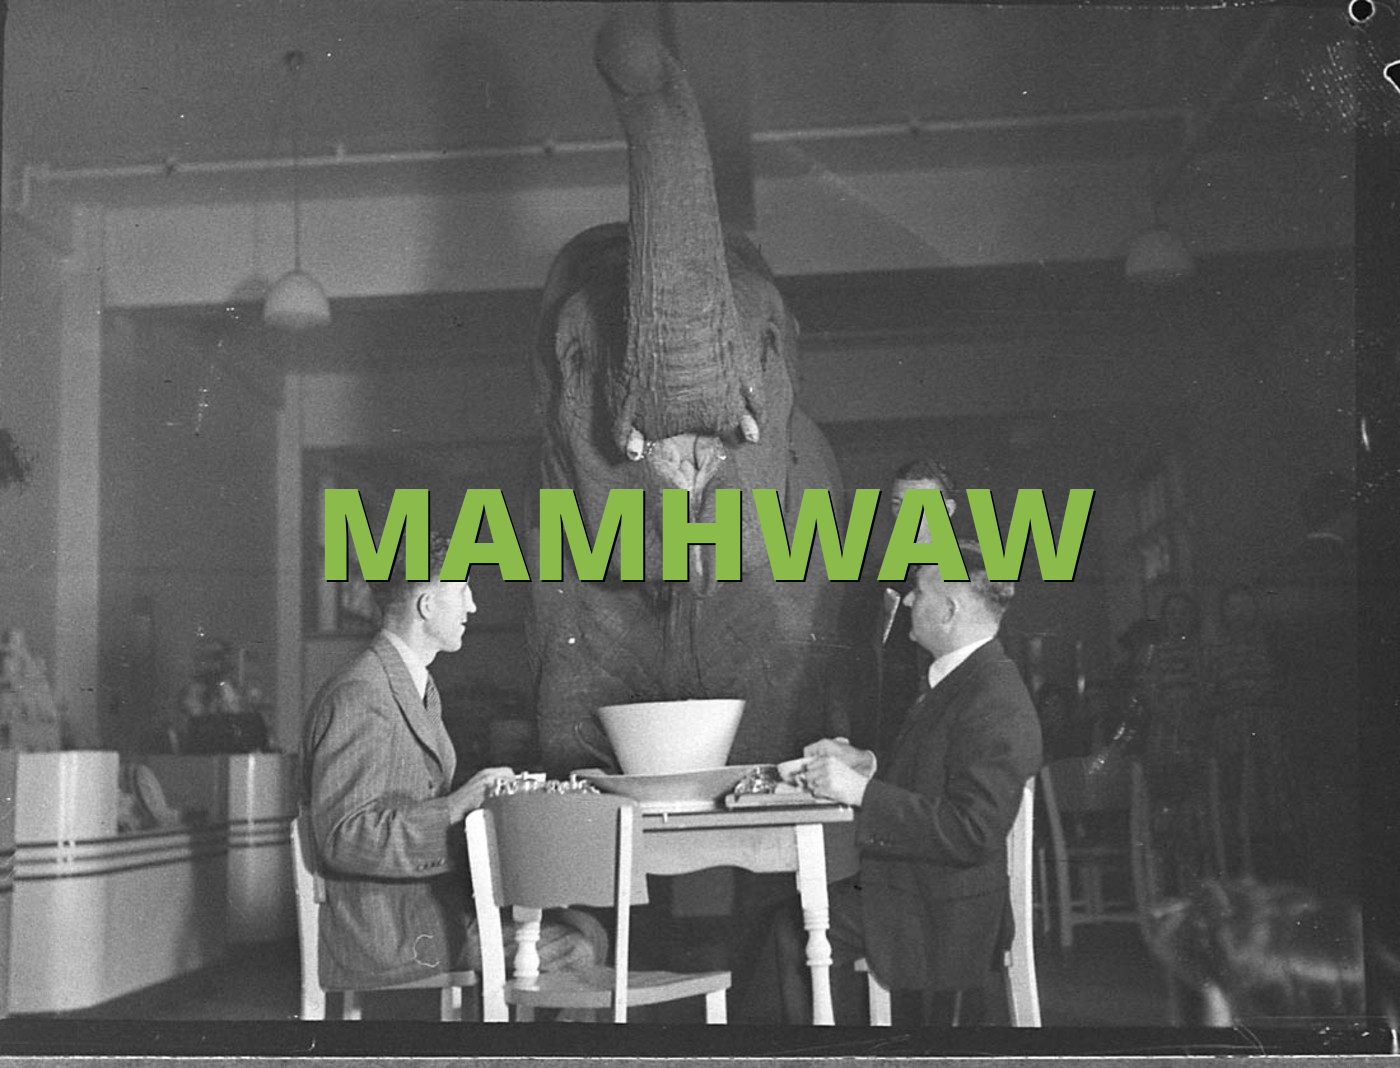 MAMHWAW